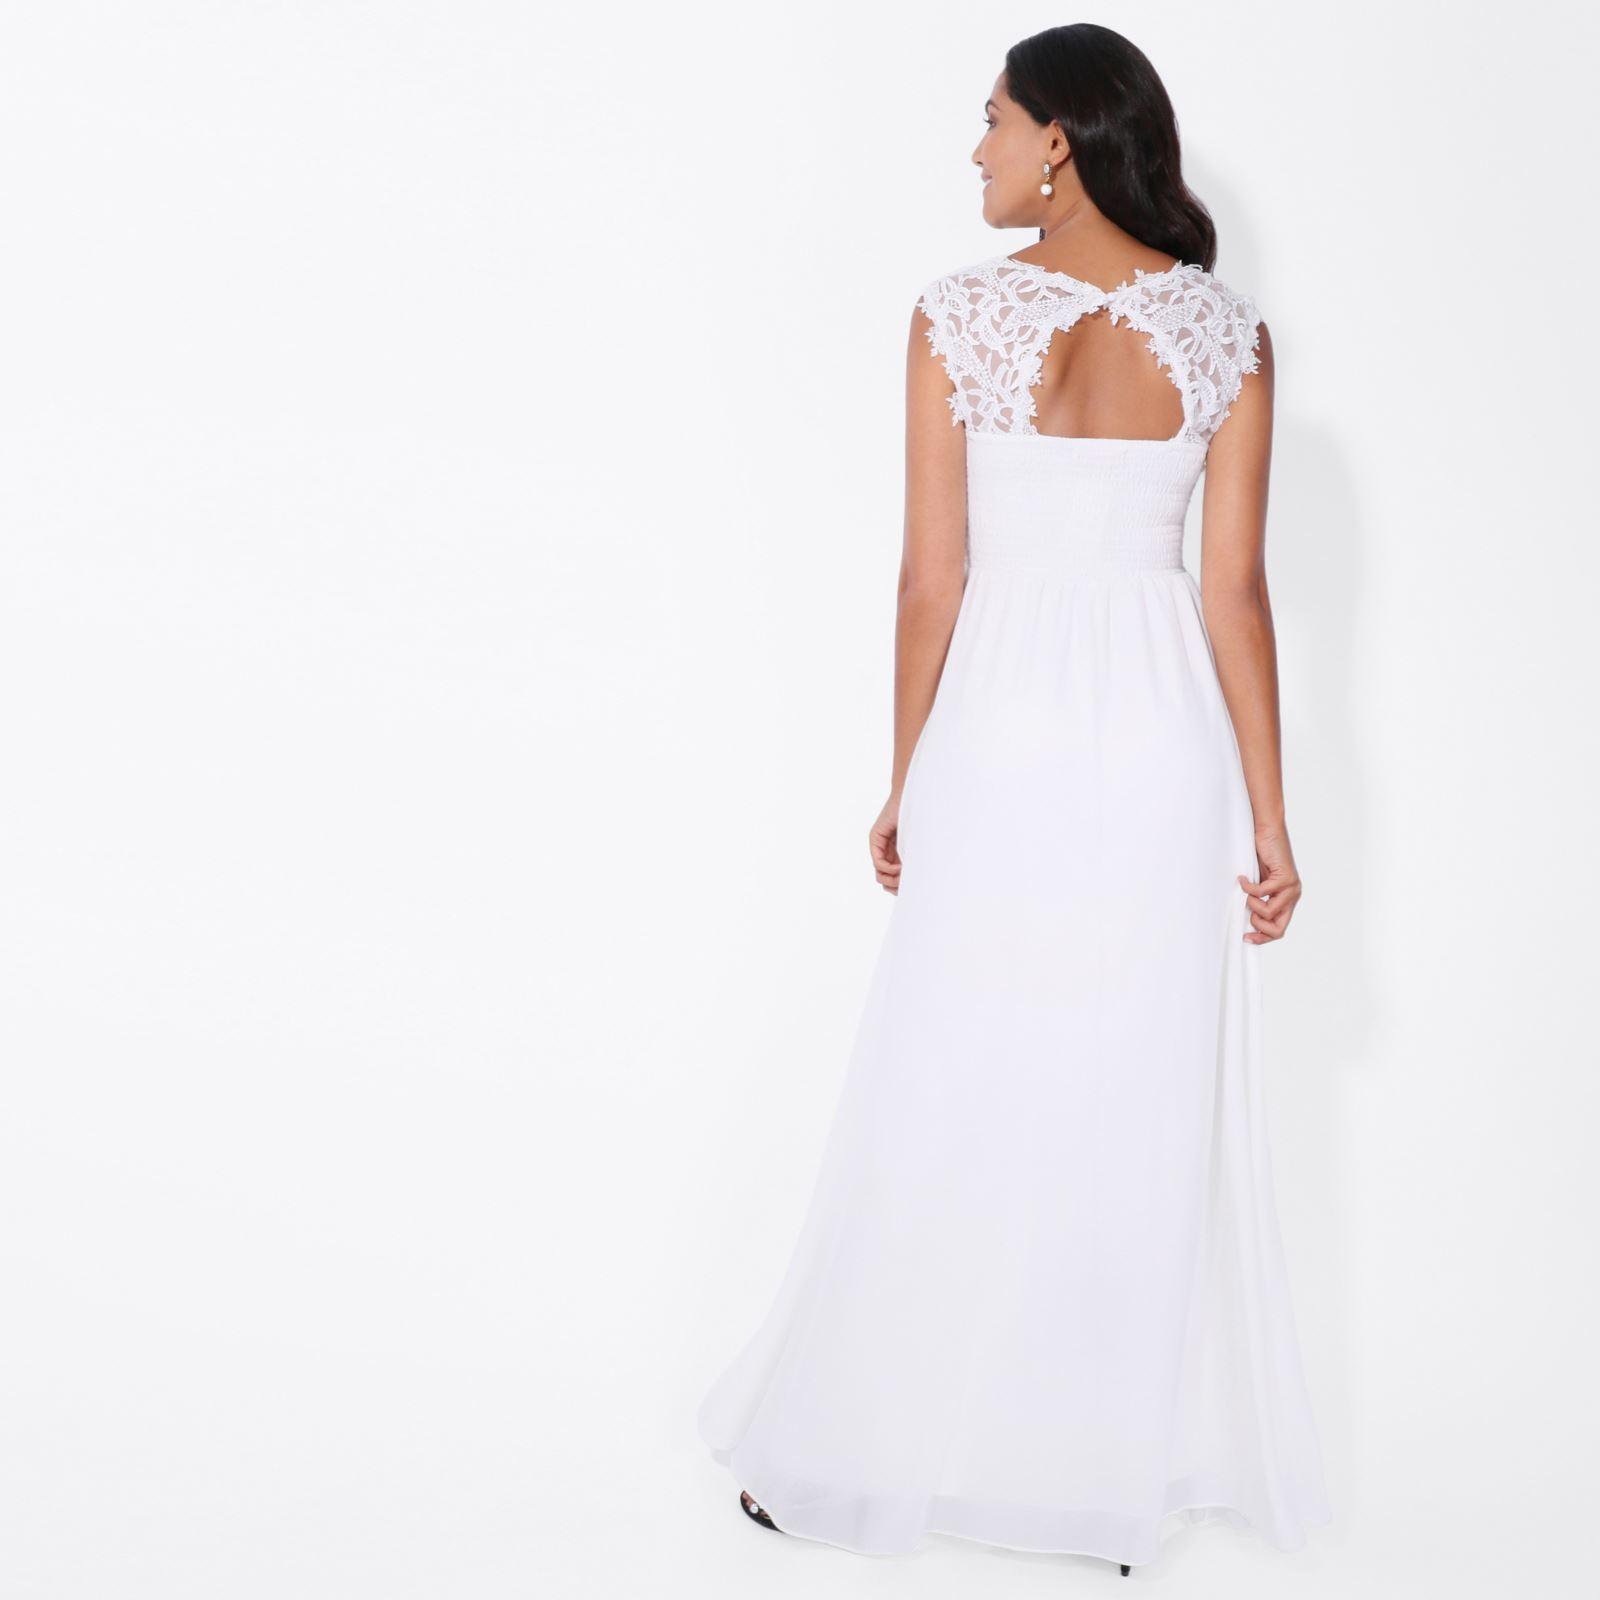 Womens-Wedding-Bridesmaid-Prom-Dress-Formal-One-Off-Shoulder-Long-Evening-8-18 thumbnail 76